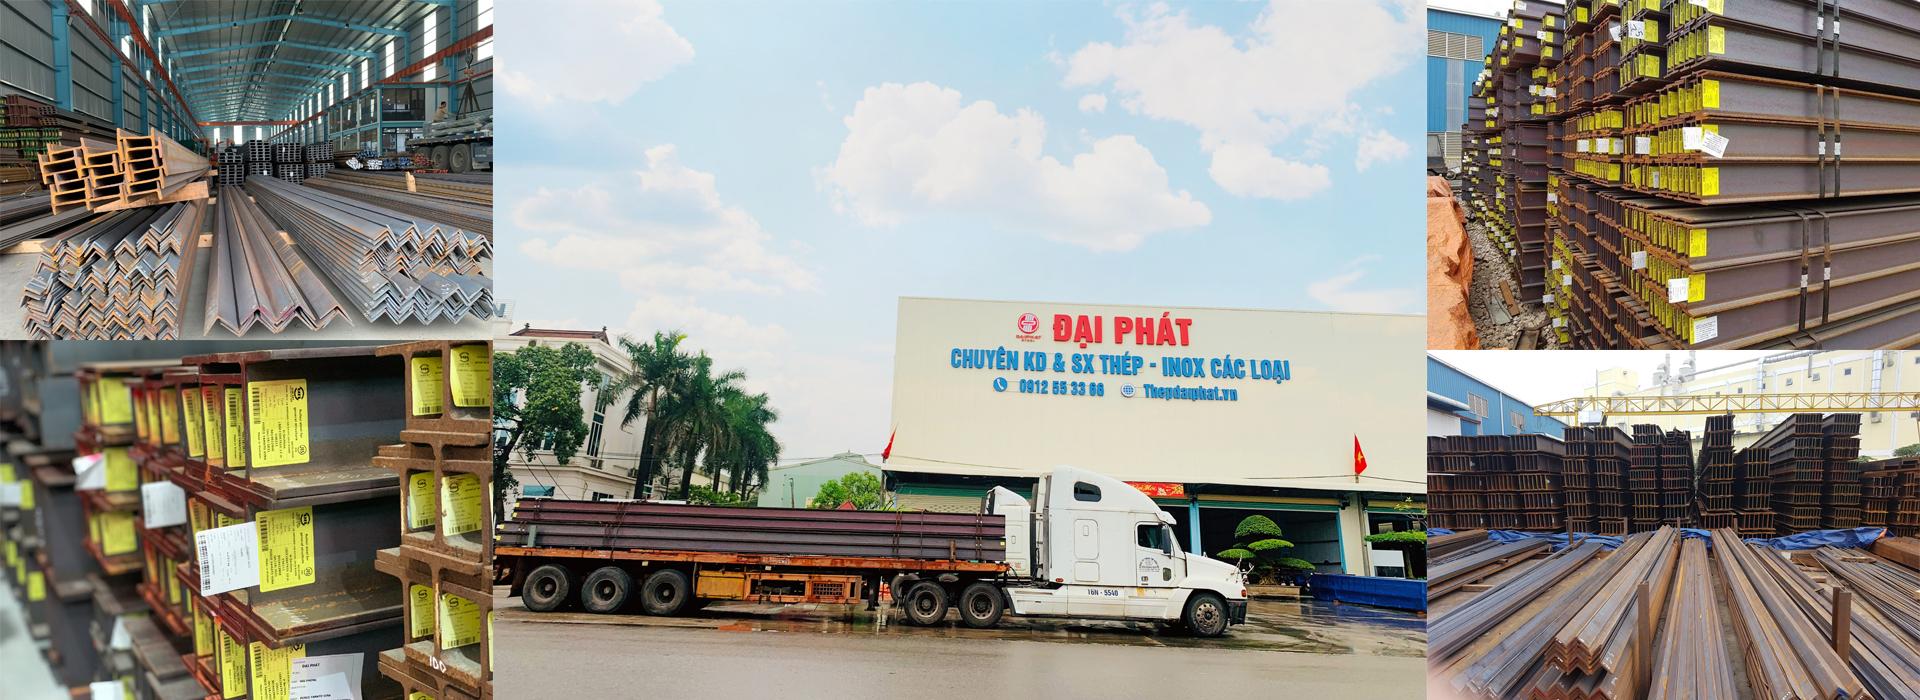 thep-hinh-Dai-Phat